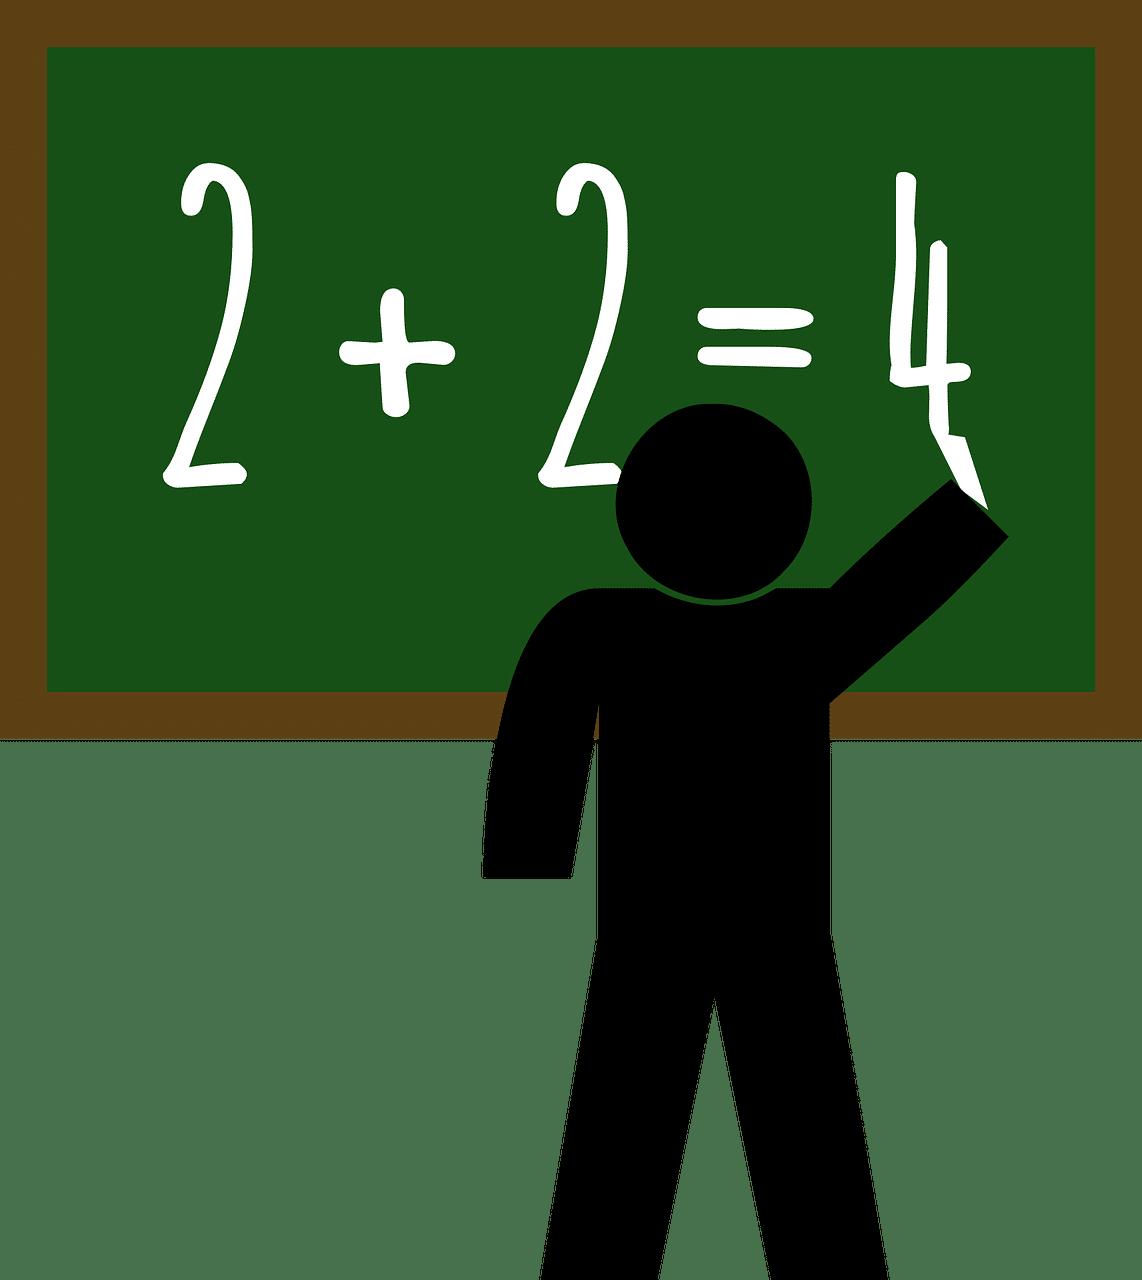 Hesston Math Academy